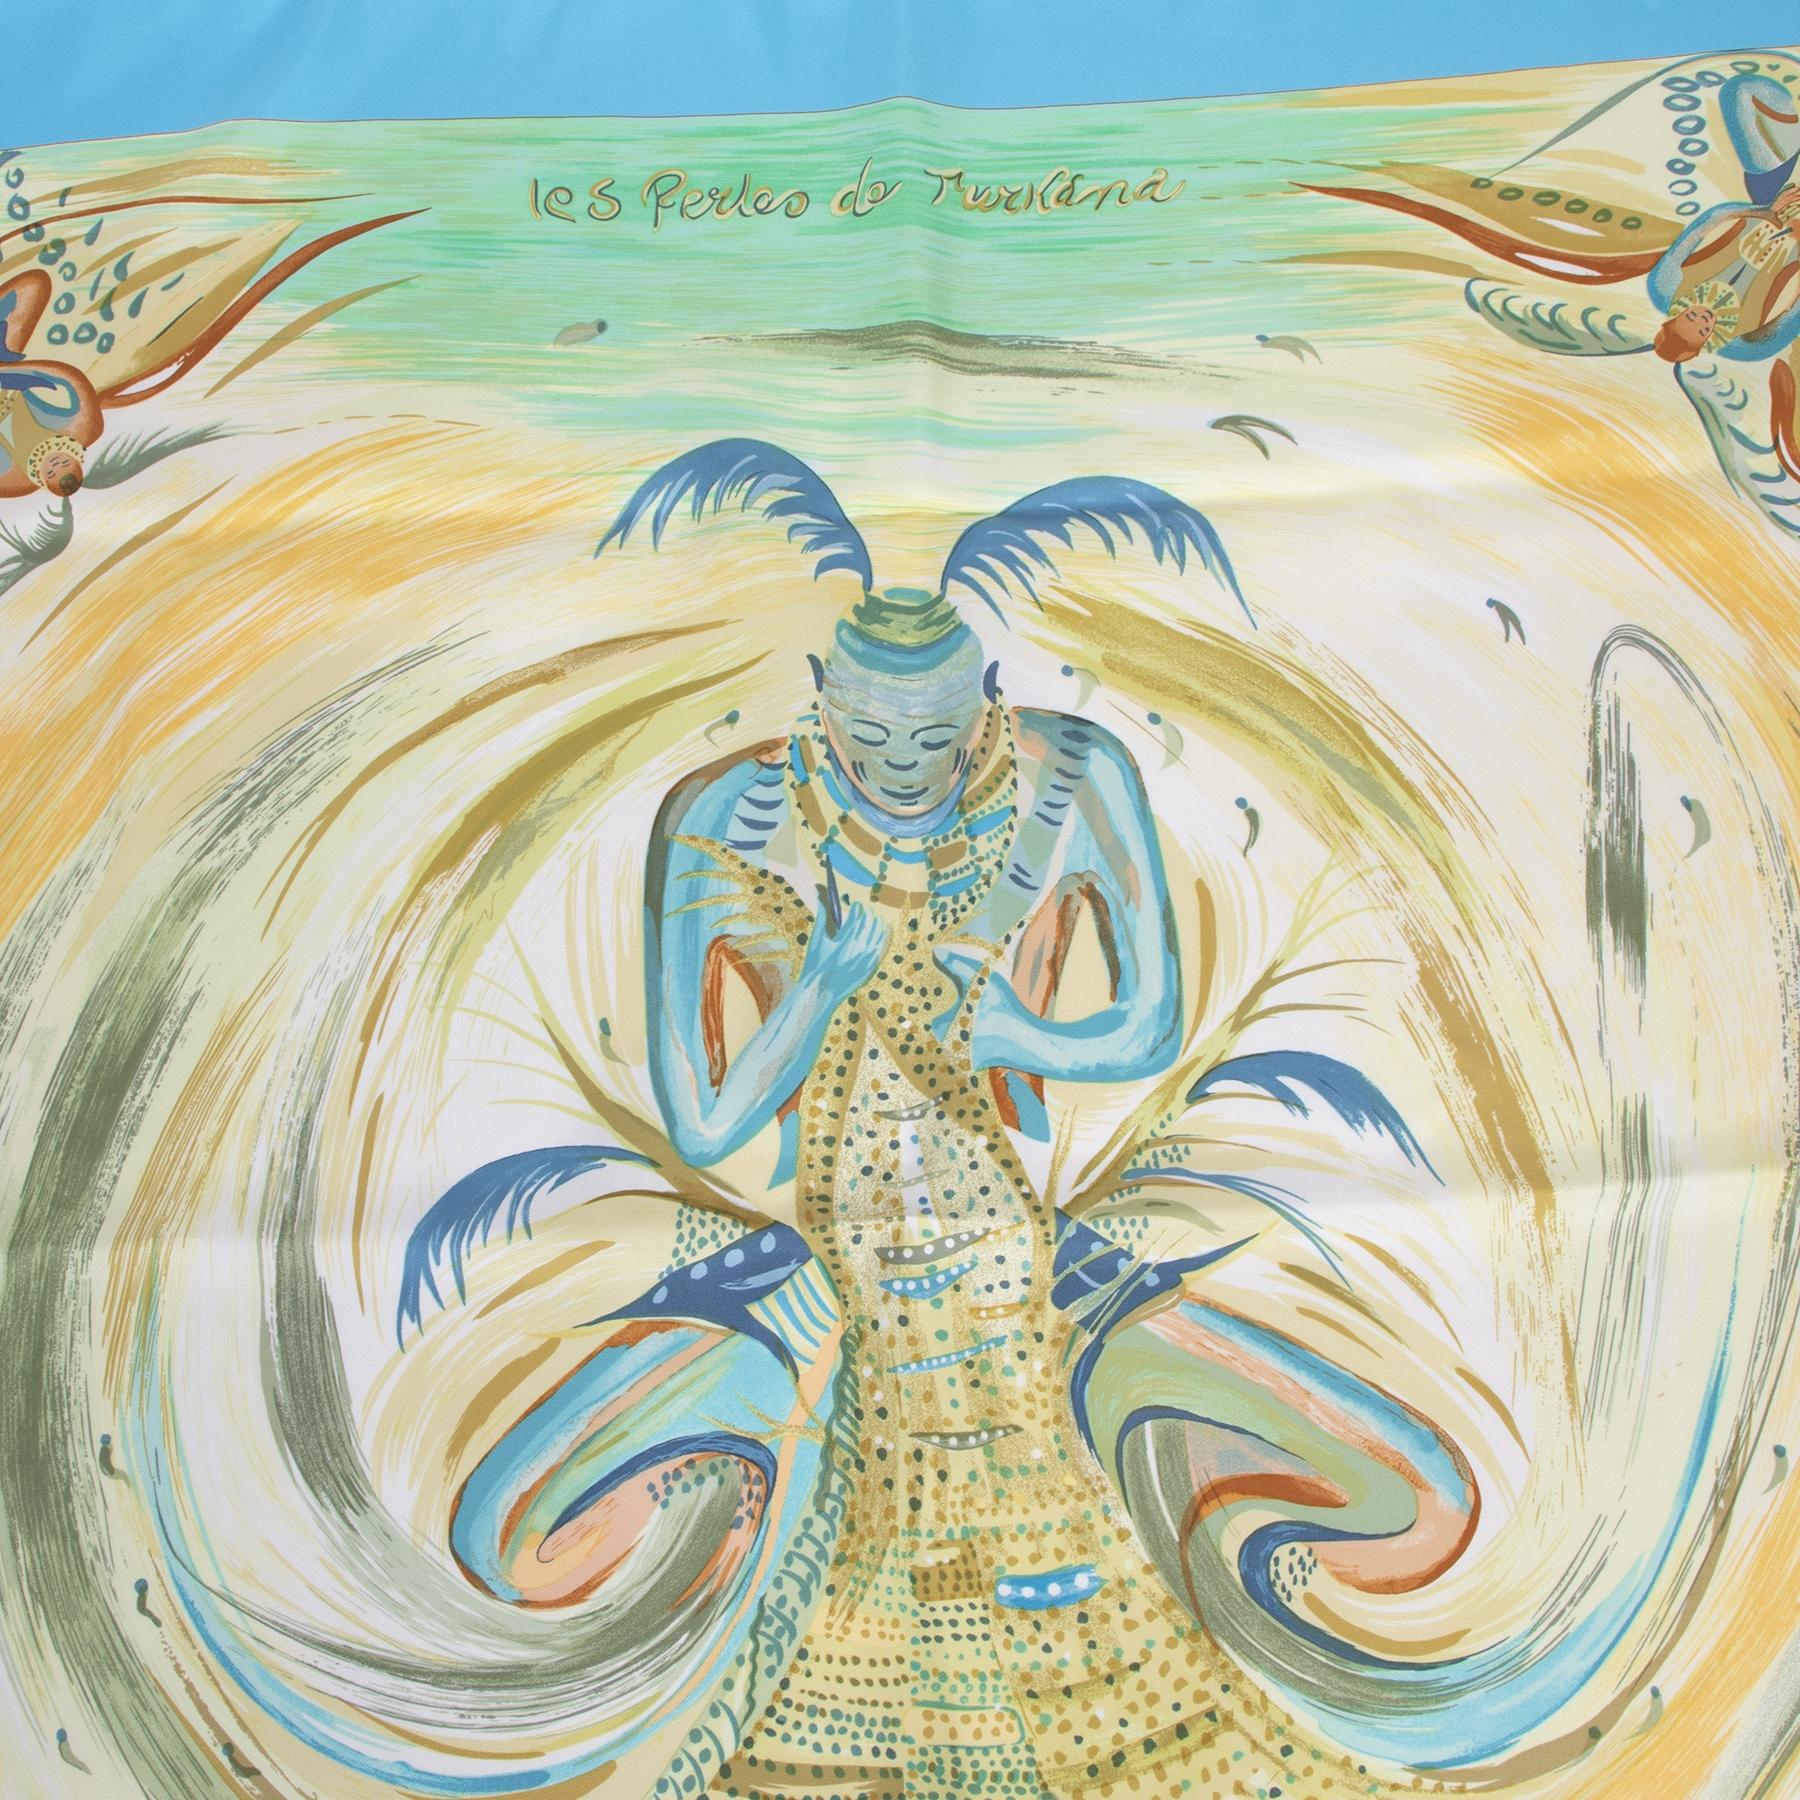 Authentieke tweedehands vintage Hermès Carré Les Perles De Turkana Scarf koop online webshop LabelLOV